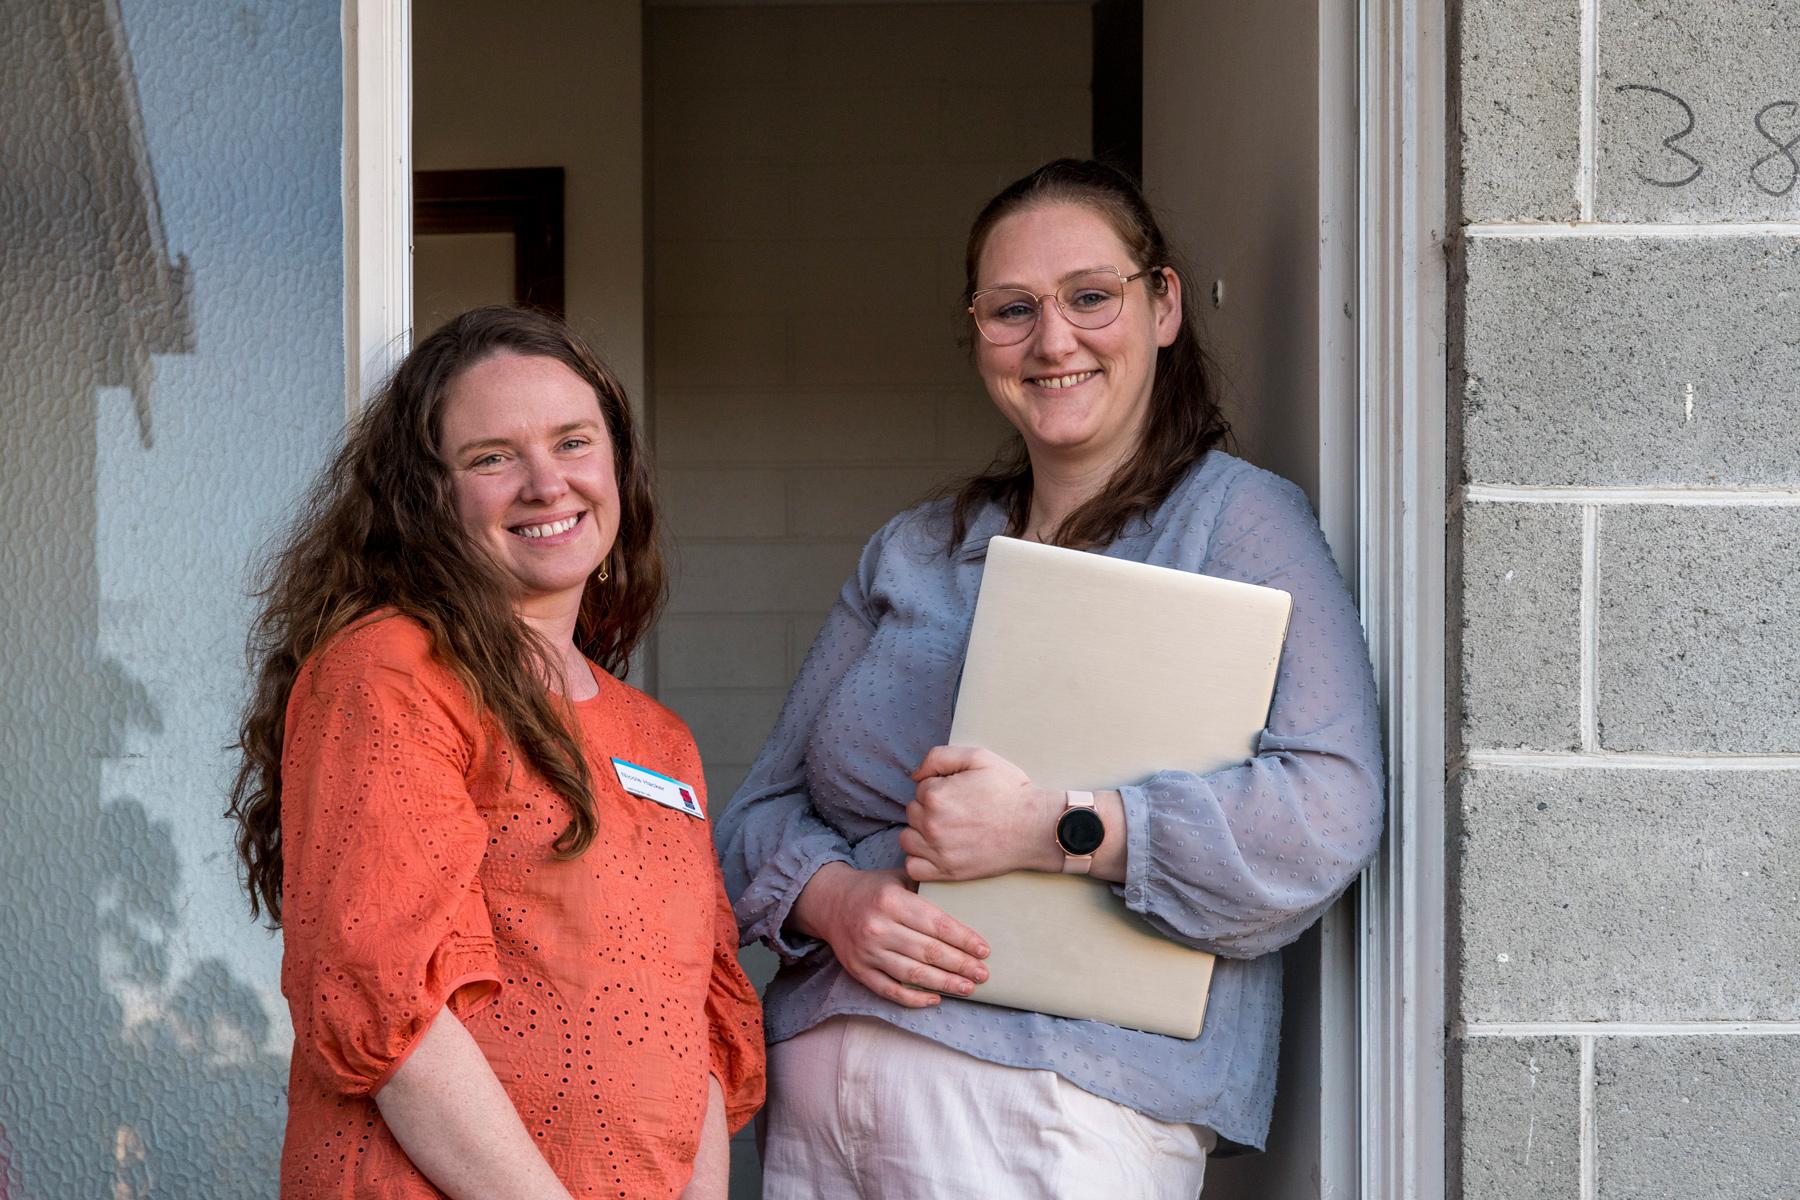 Saver Plus coordinator Nicole and Cassie